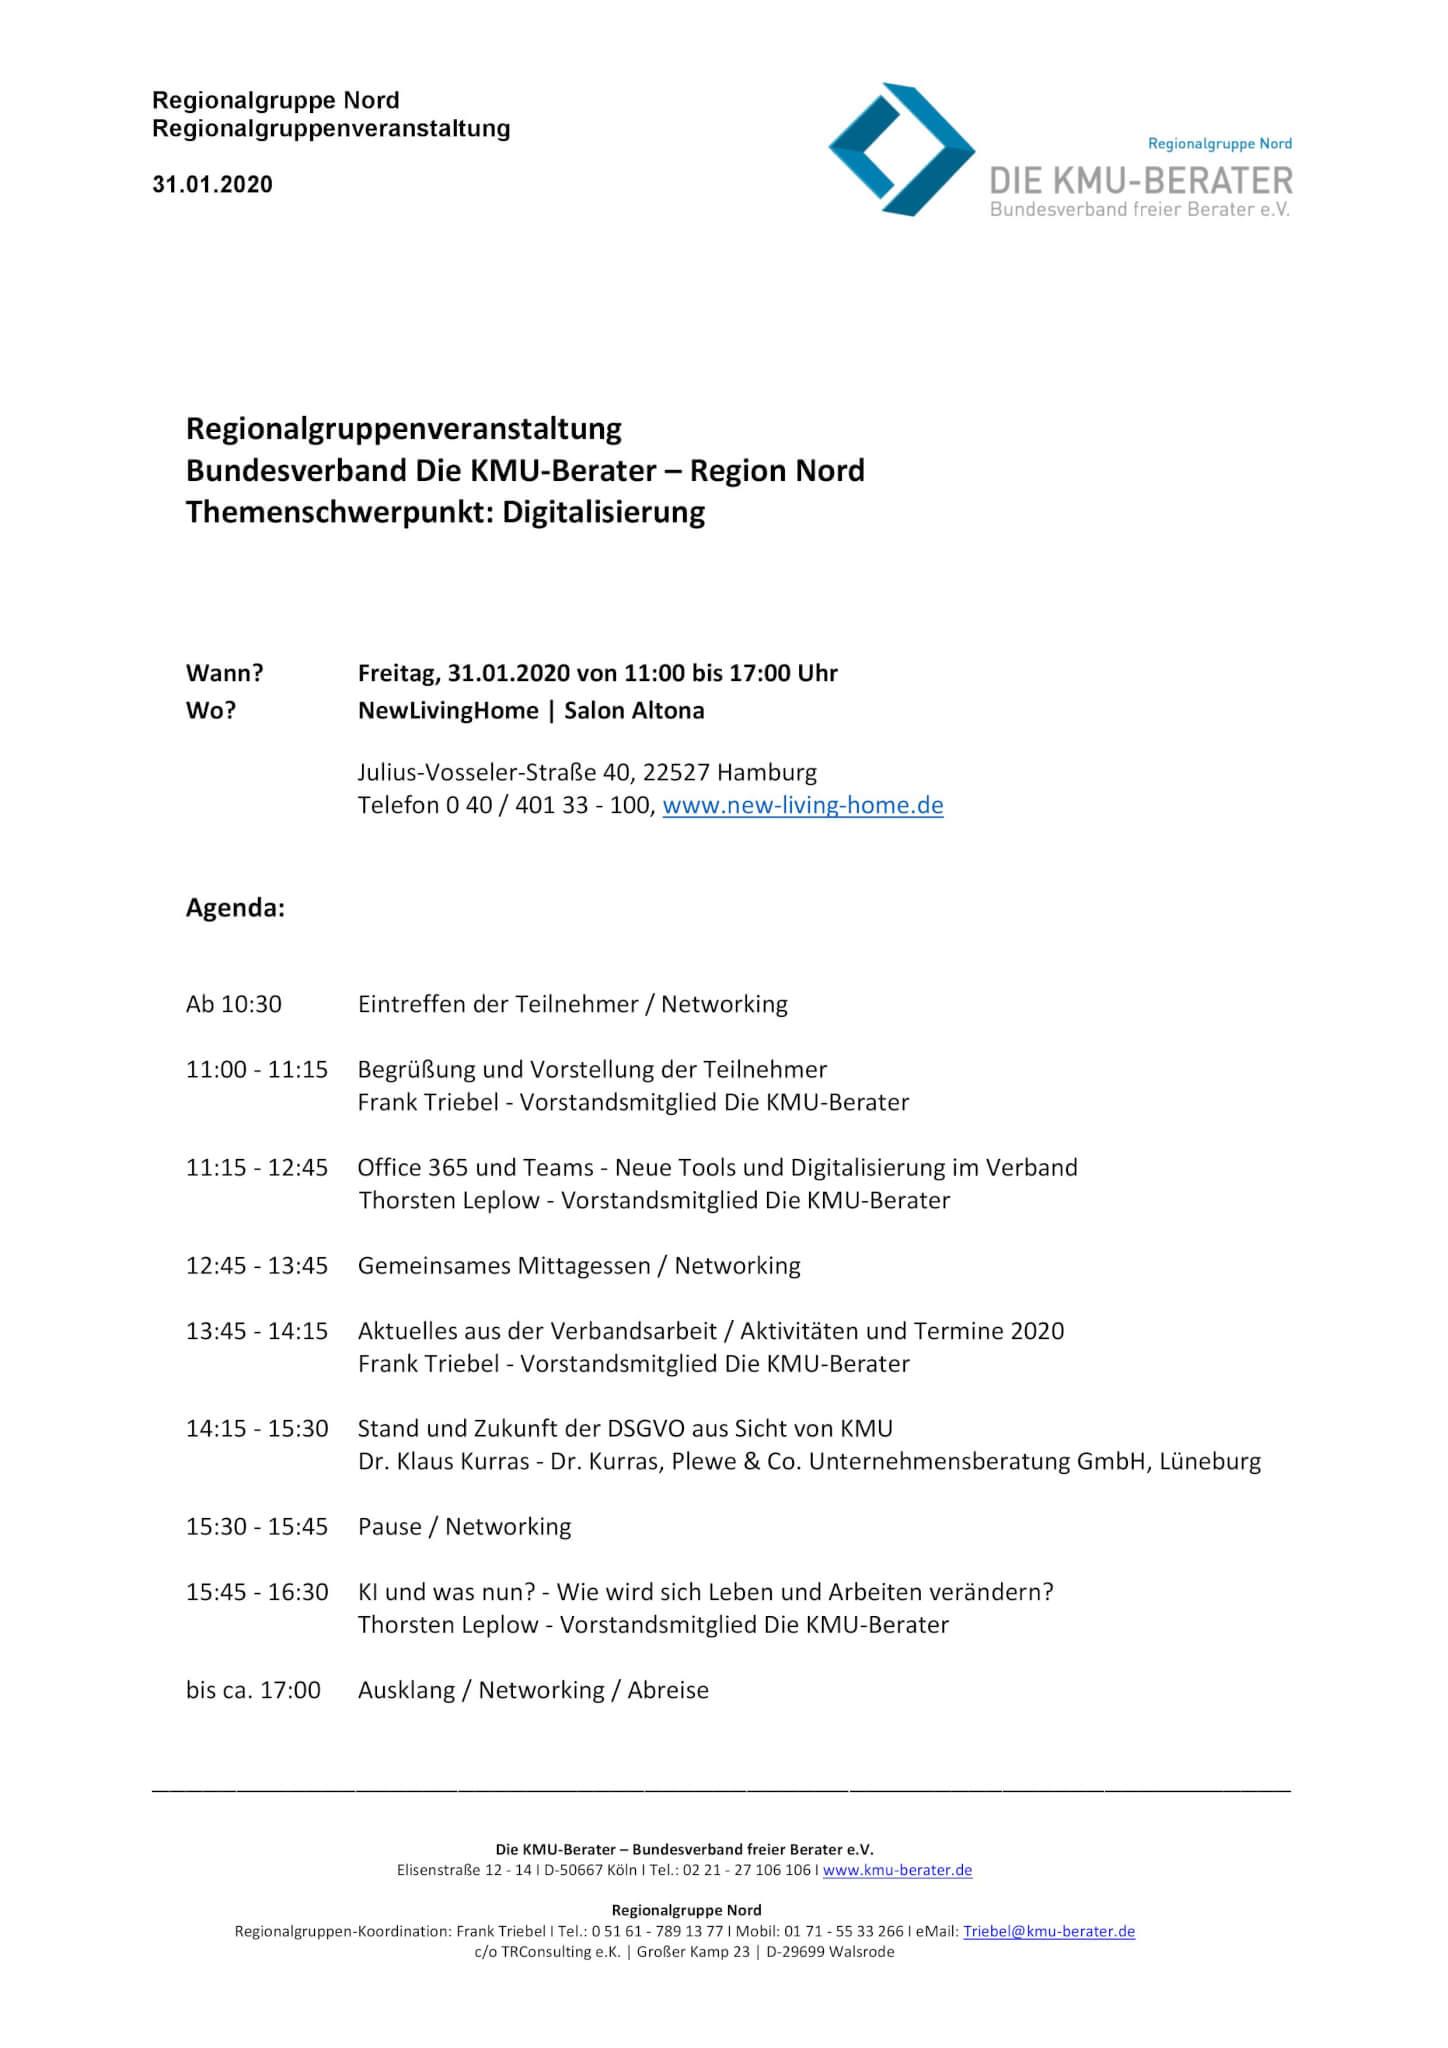 Agenda-Tagung-Regionalgruppe-Nord